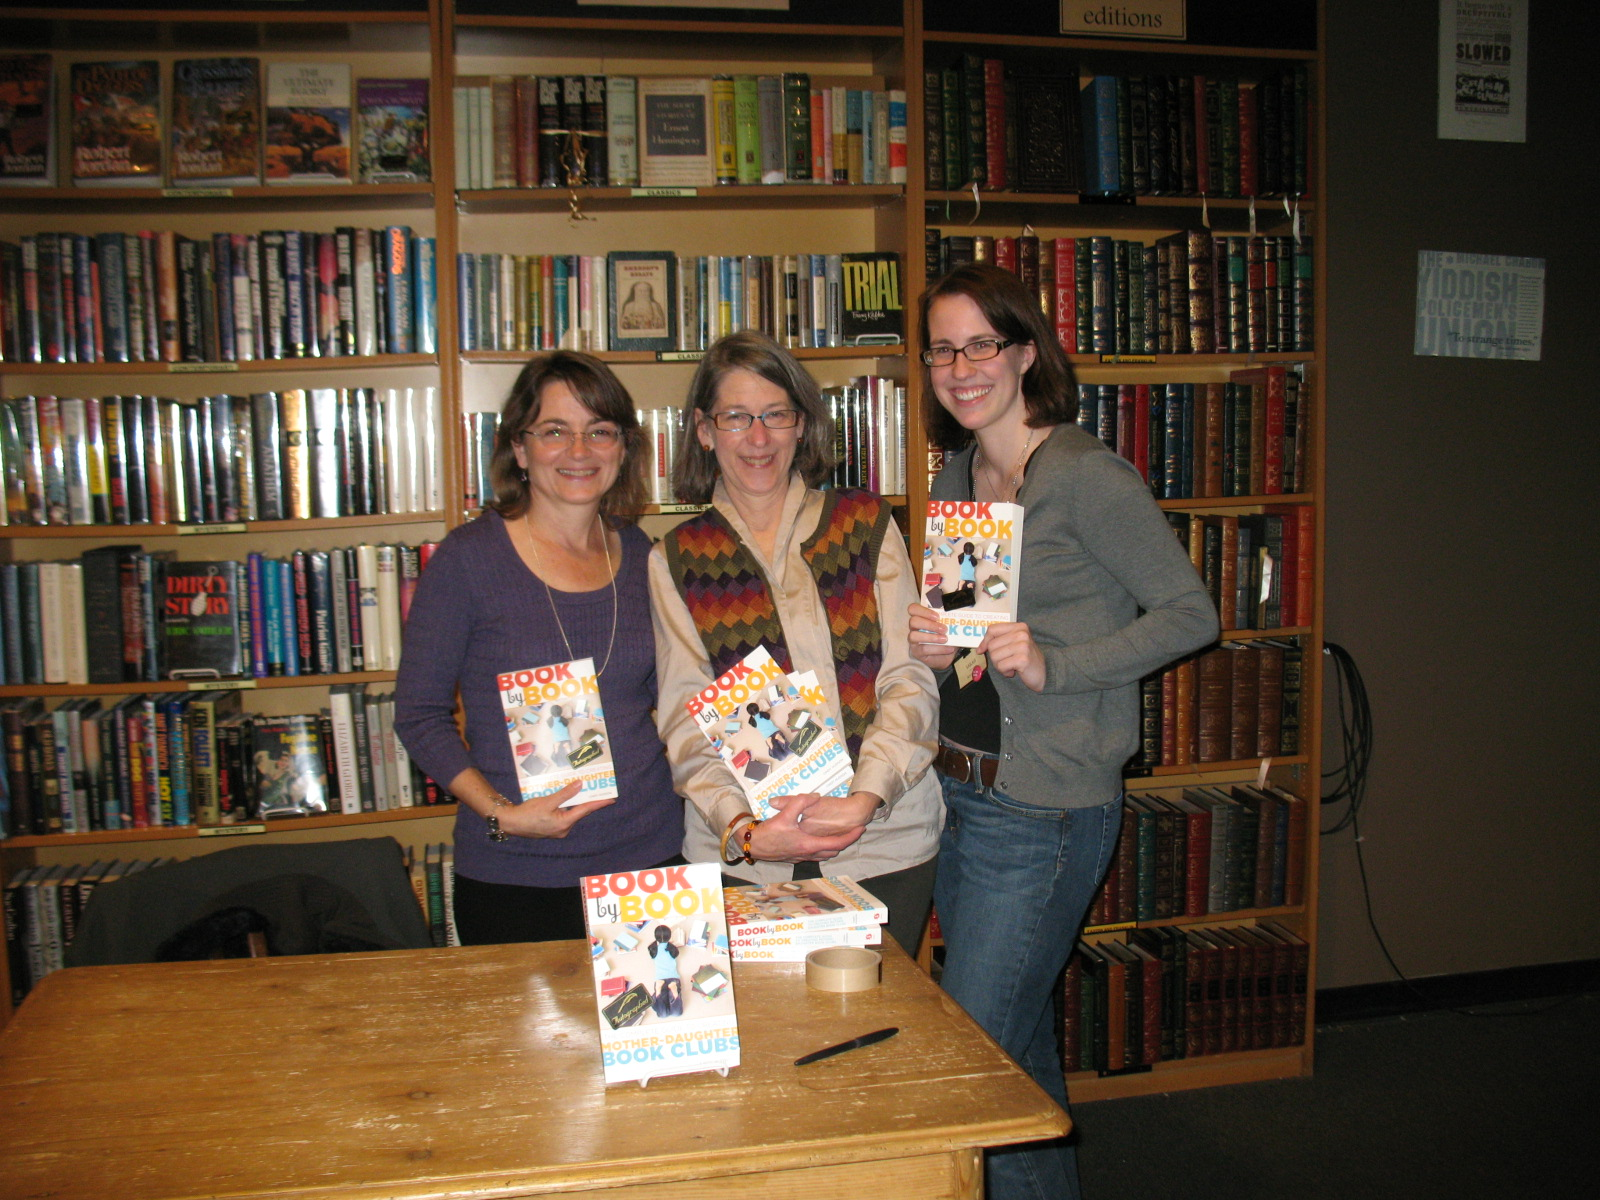 Cindy Hudson at Third Place Books